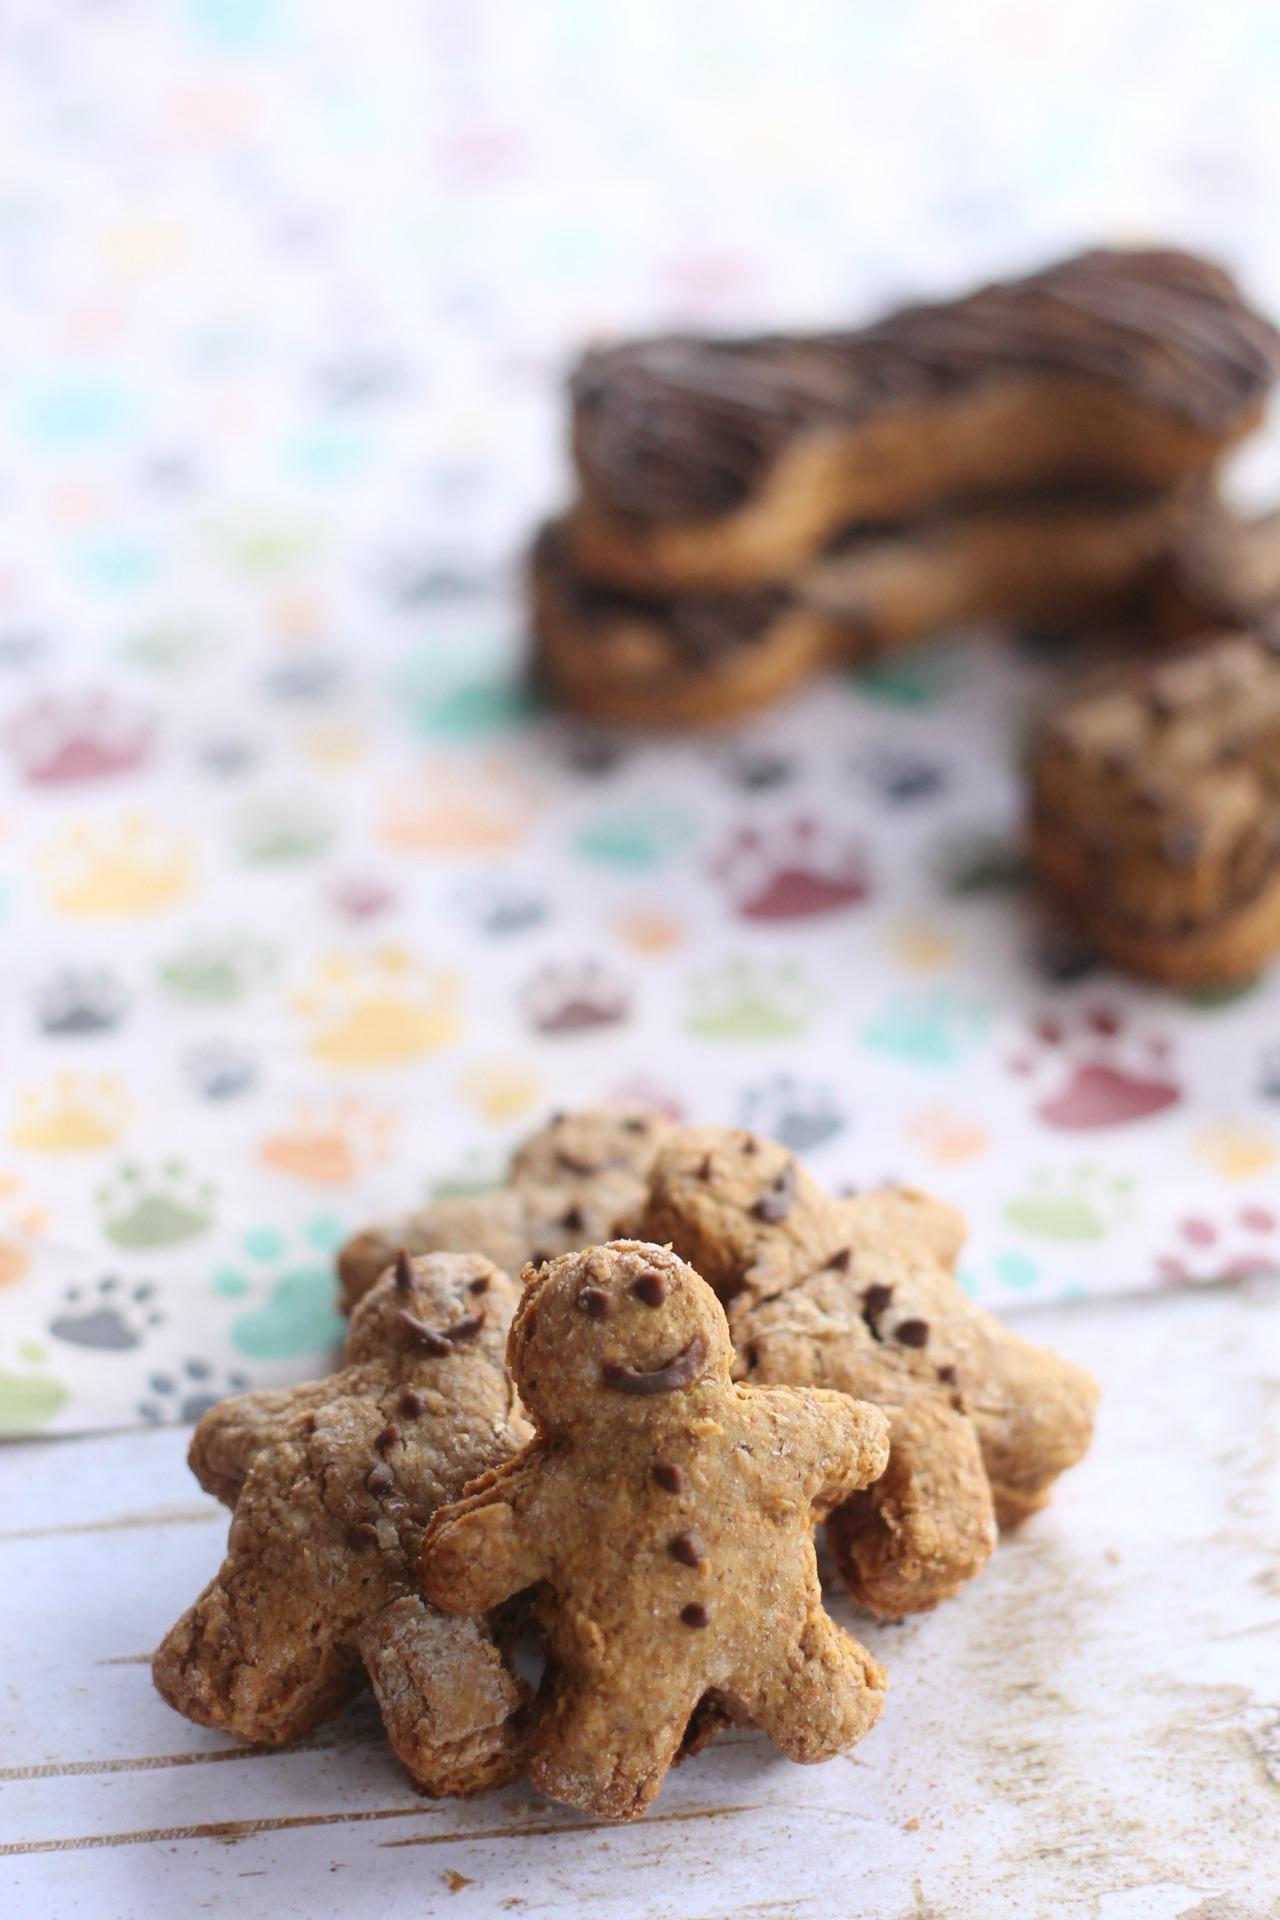 Homemade Gingerbread Dog Treats with Carob Icing